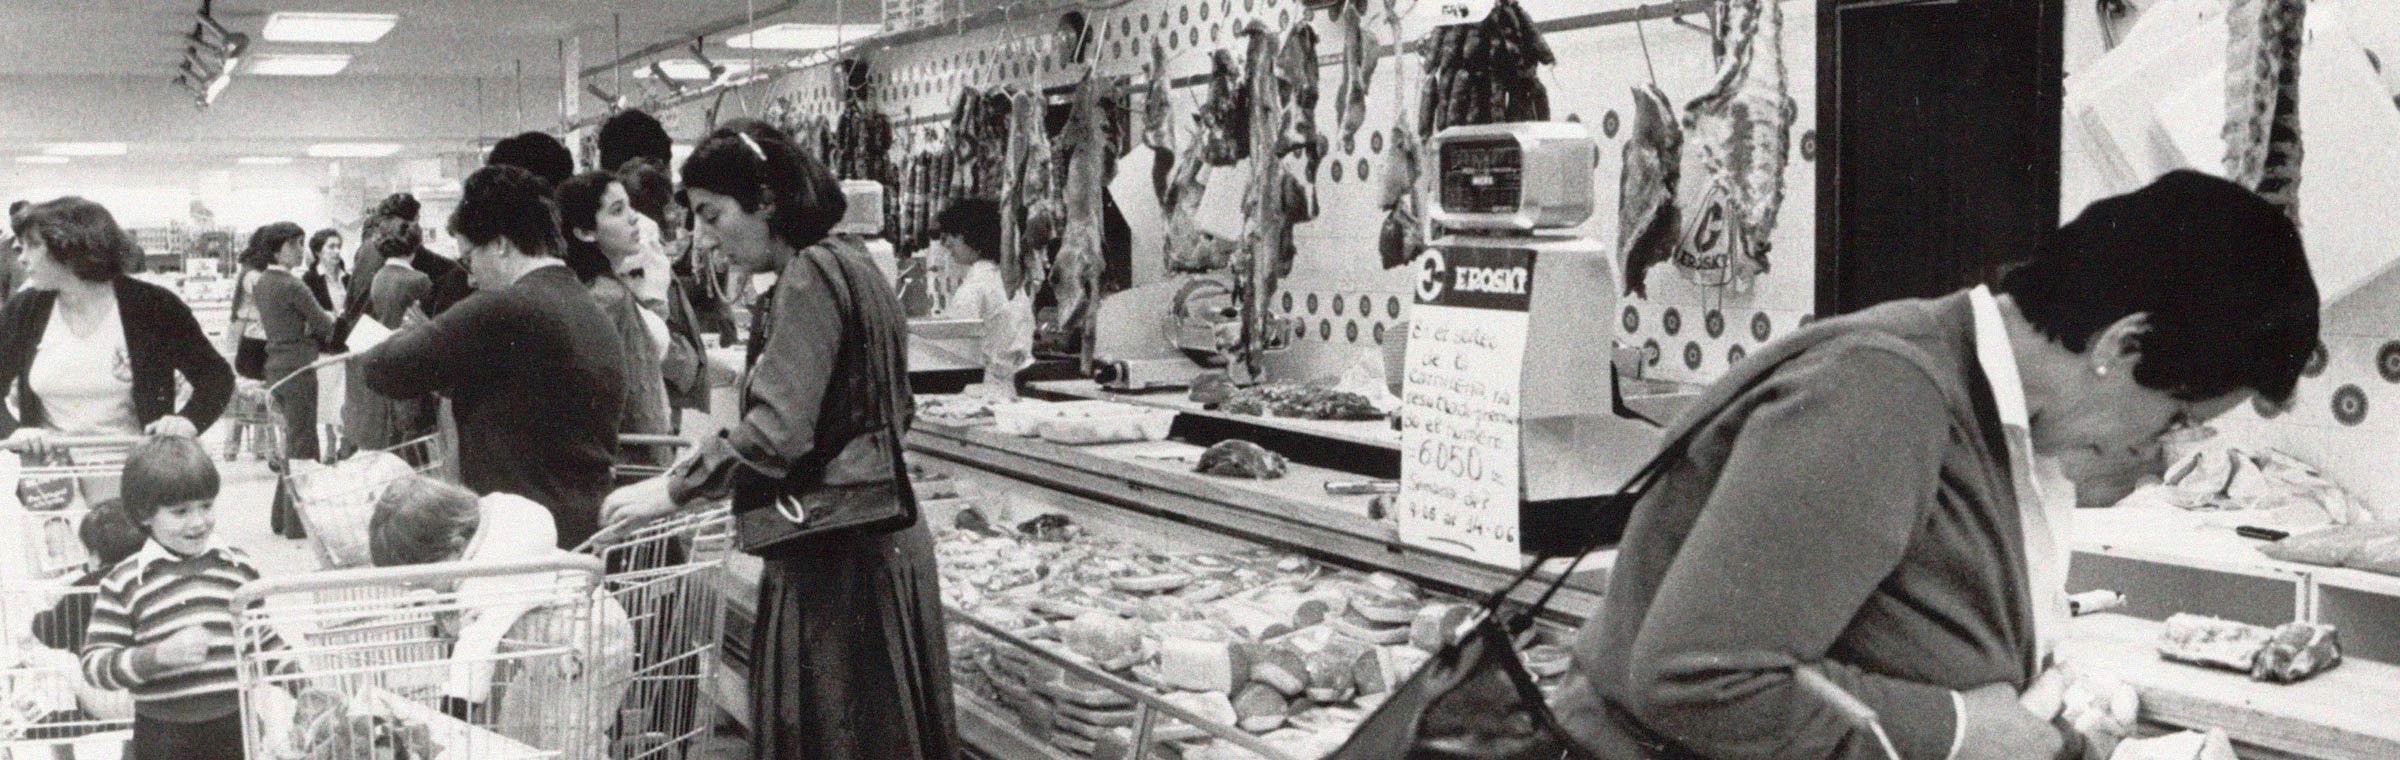 Clientes supermercado Eroski foto antigua